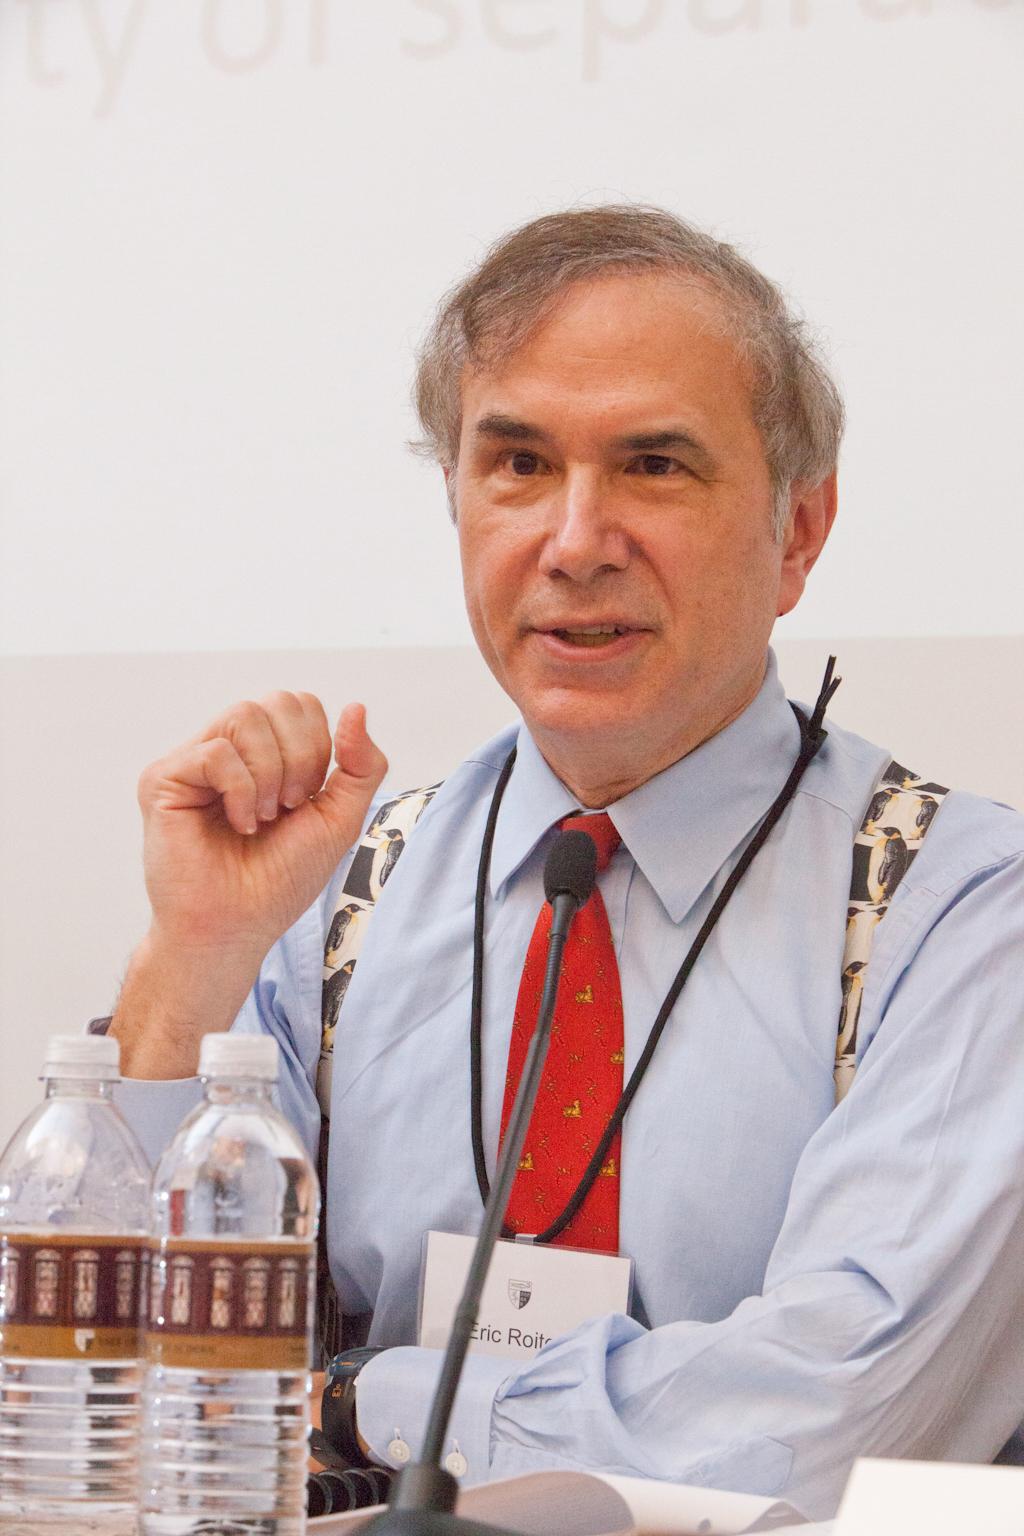 Boston U. Law Lecturer Eric Roiter